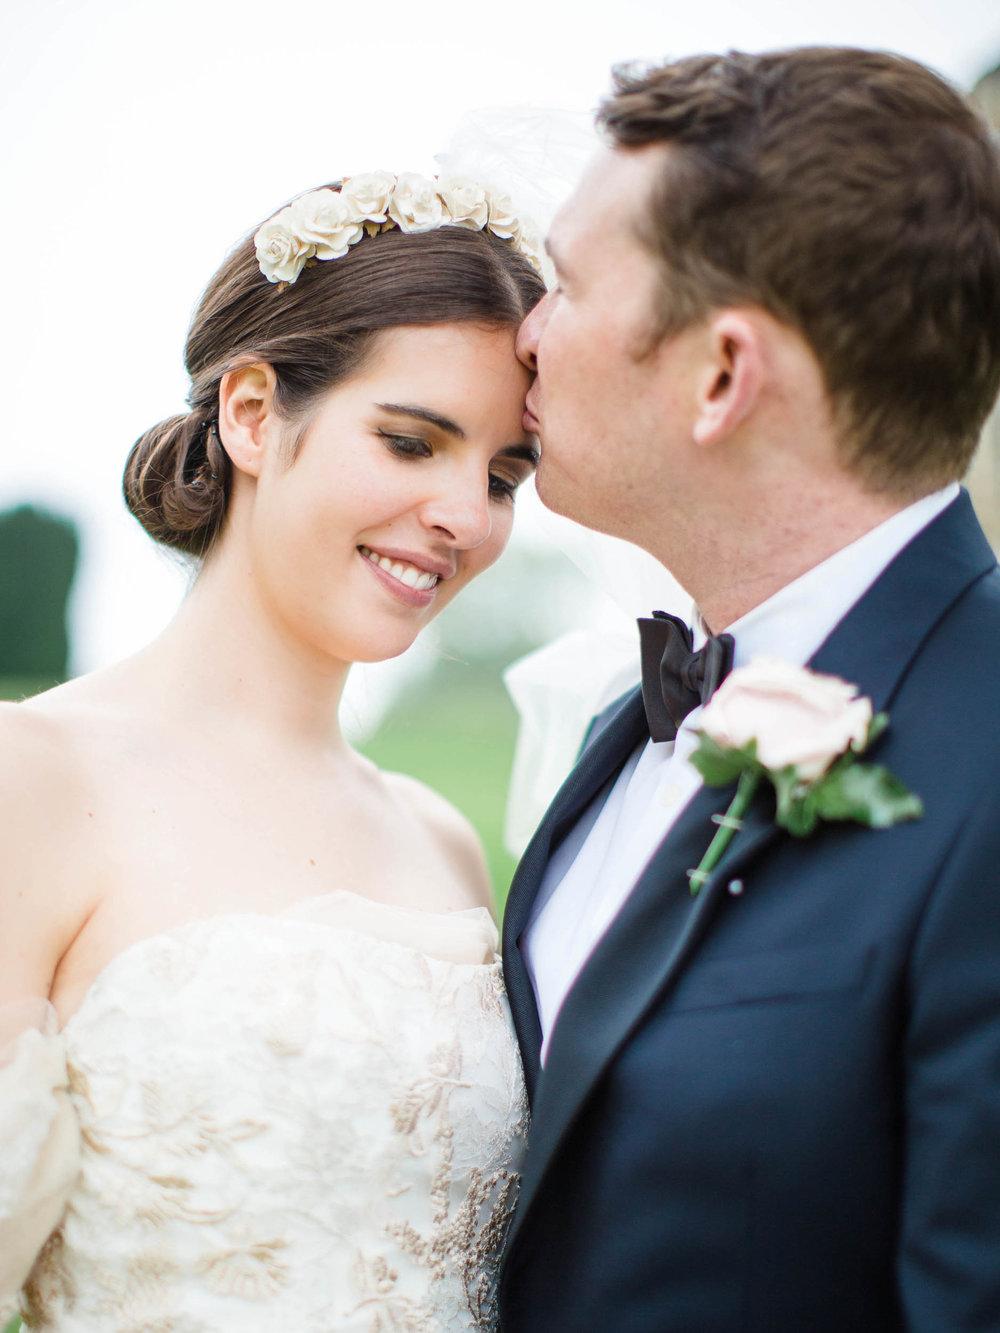 Amy O'Boyle Photography- Destination & UK Fine Art Film Wedding Photographer- Stoneleigh Abbey Wedding-58.jpg